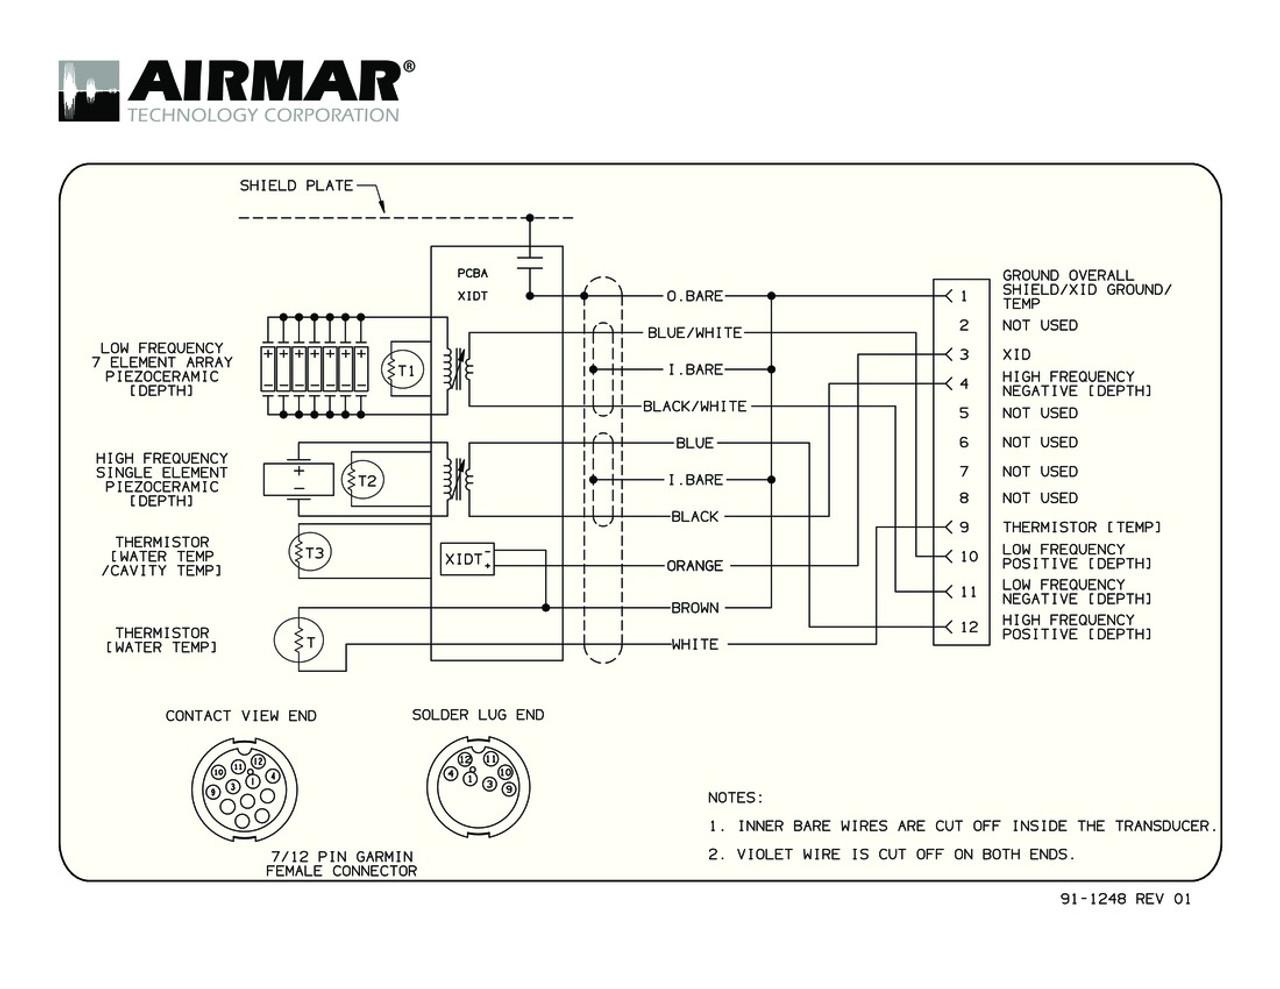 ipad microphone wiring diagram raymarine microphone wiring diagram | wiring library raymarine microphone wiring diagram